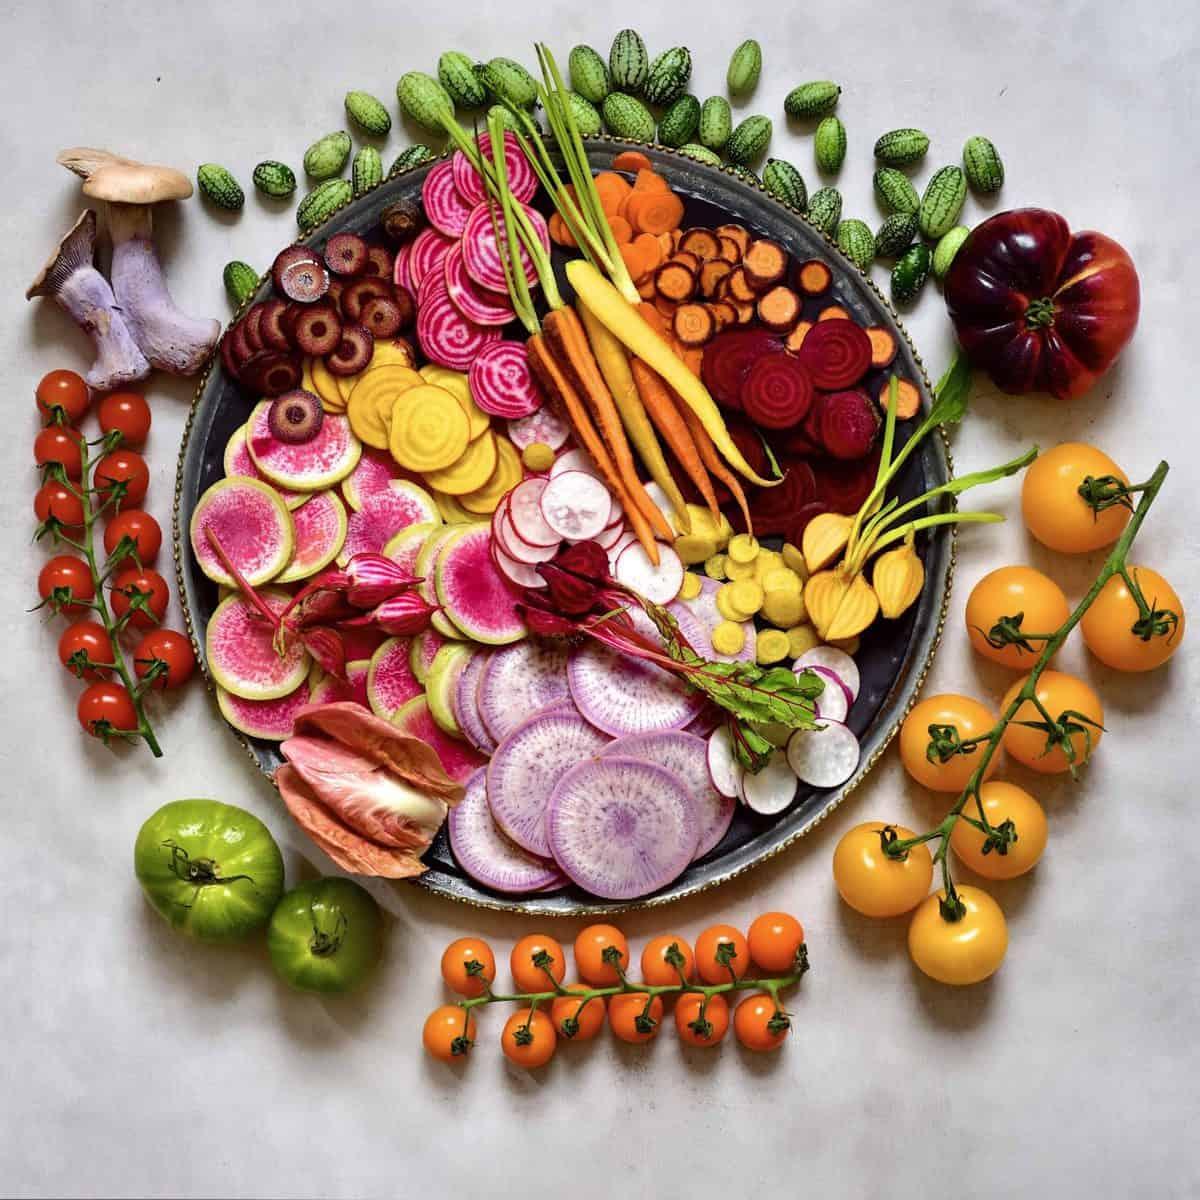 Veggie platter with rainbow veggies